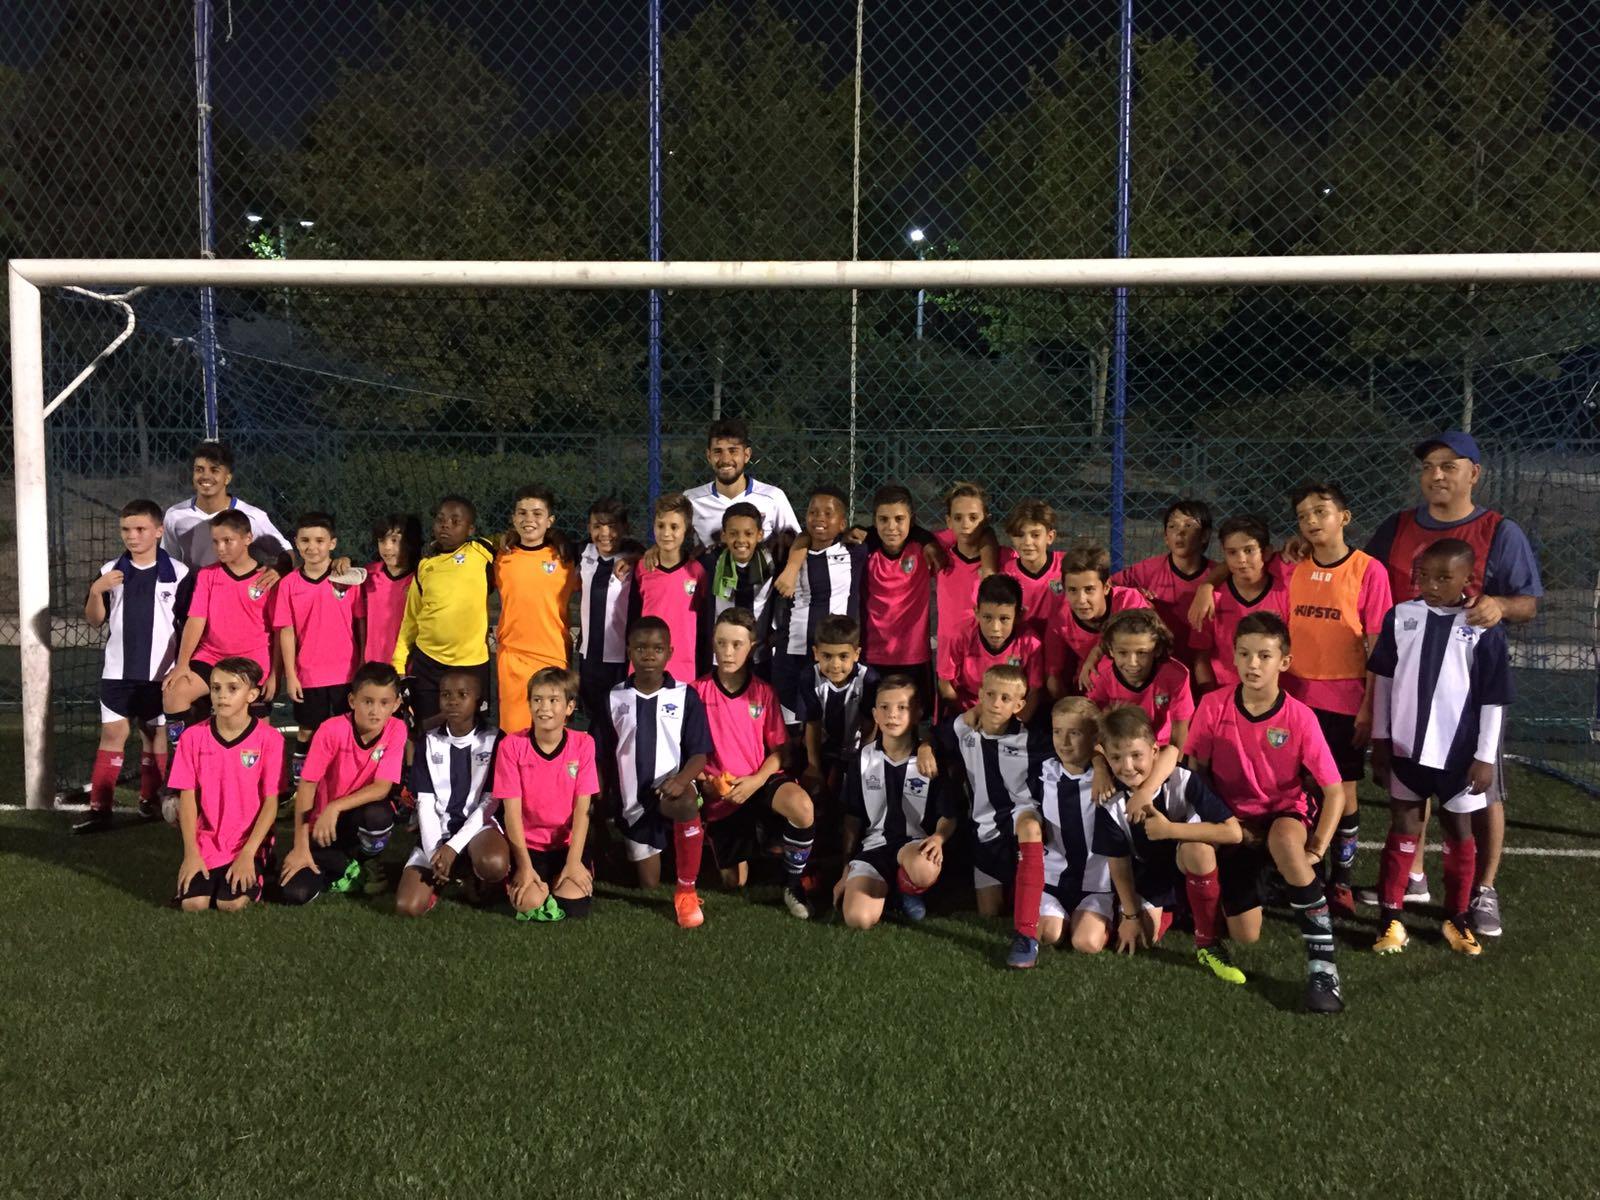 Fotos del partido amistoso Alevín A vs Education Through Soccer